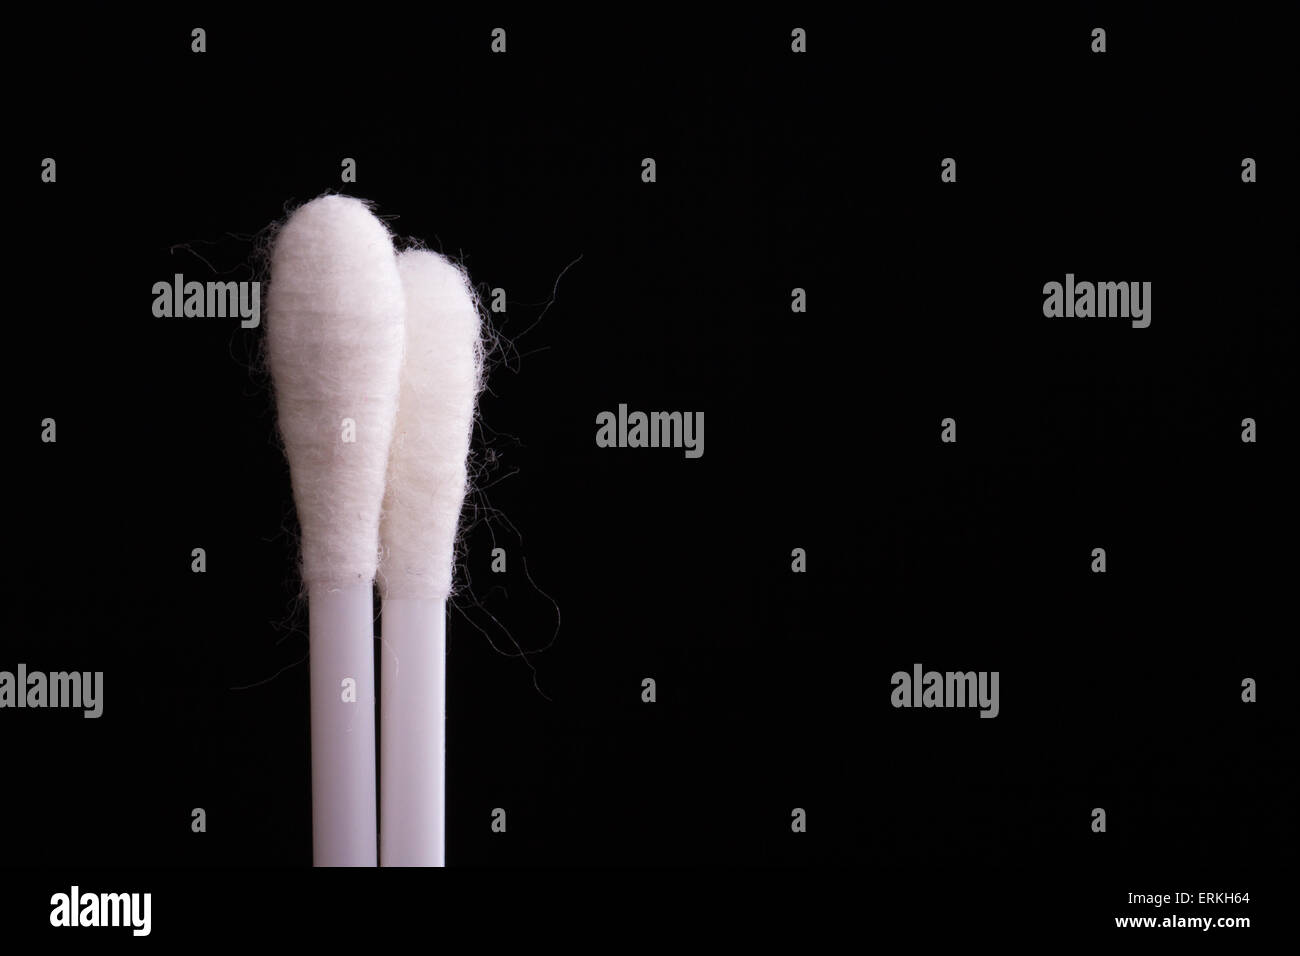 White cotton swabs on black background. - Stock Image